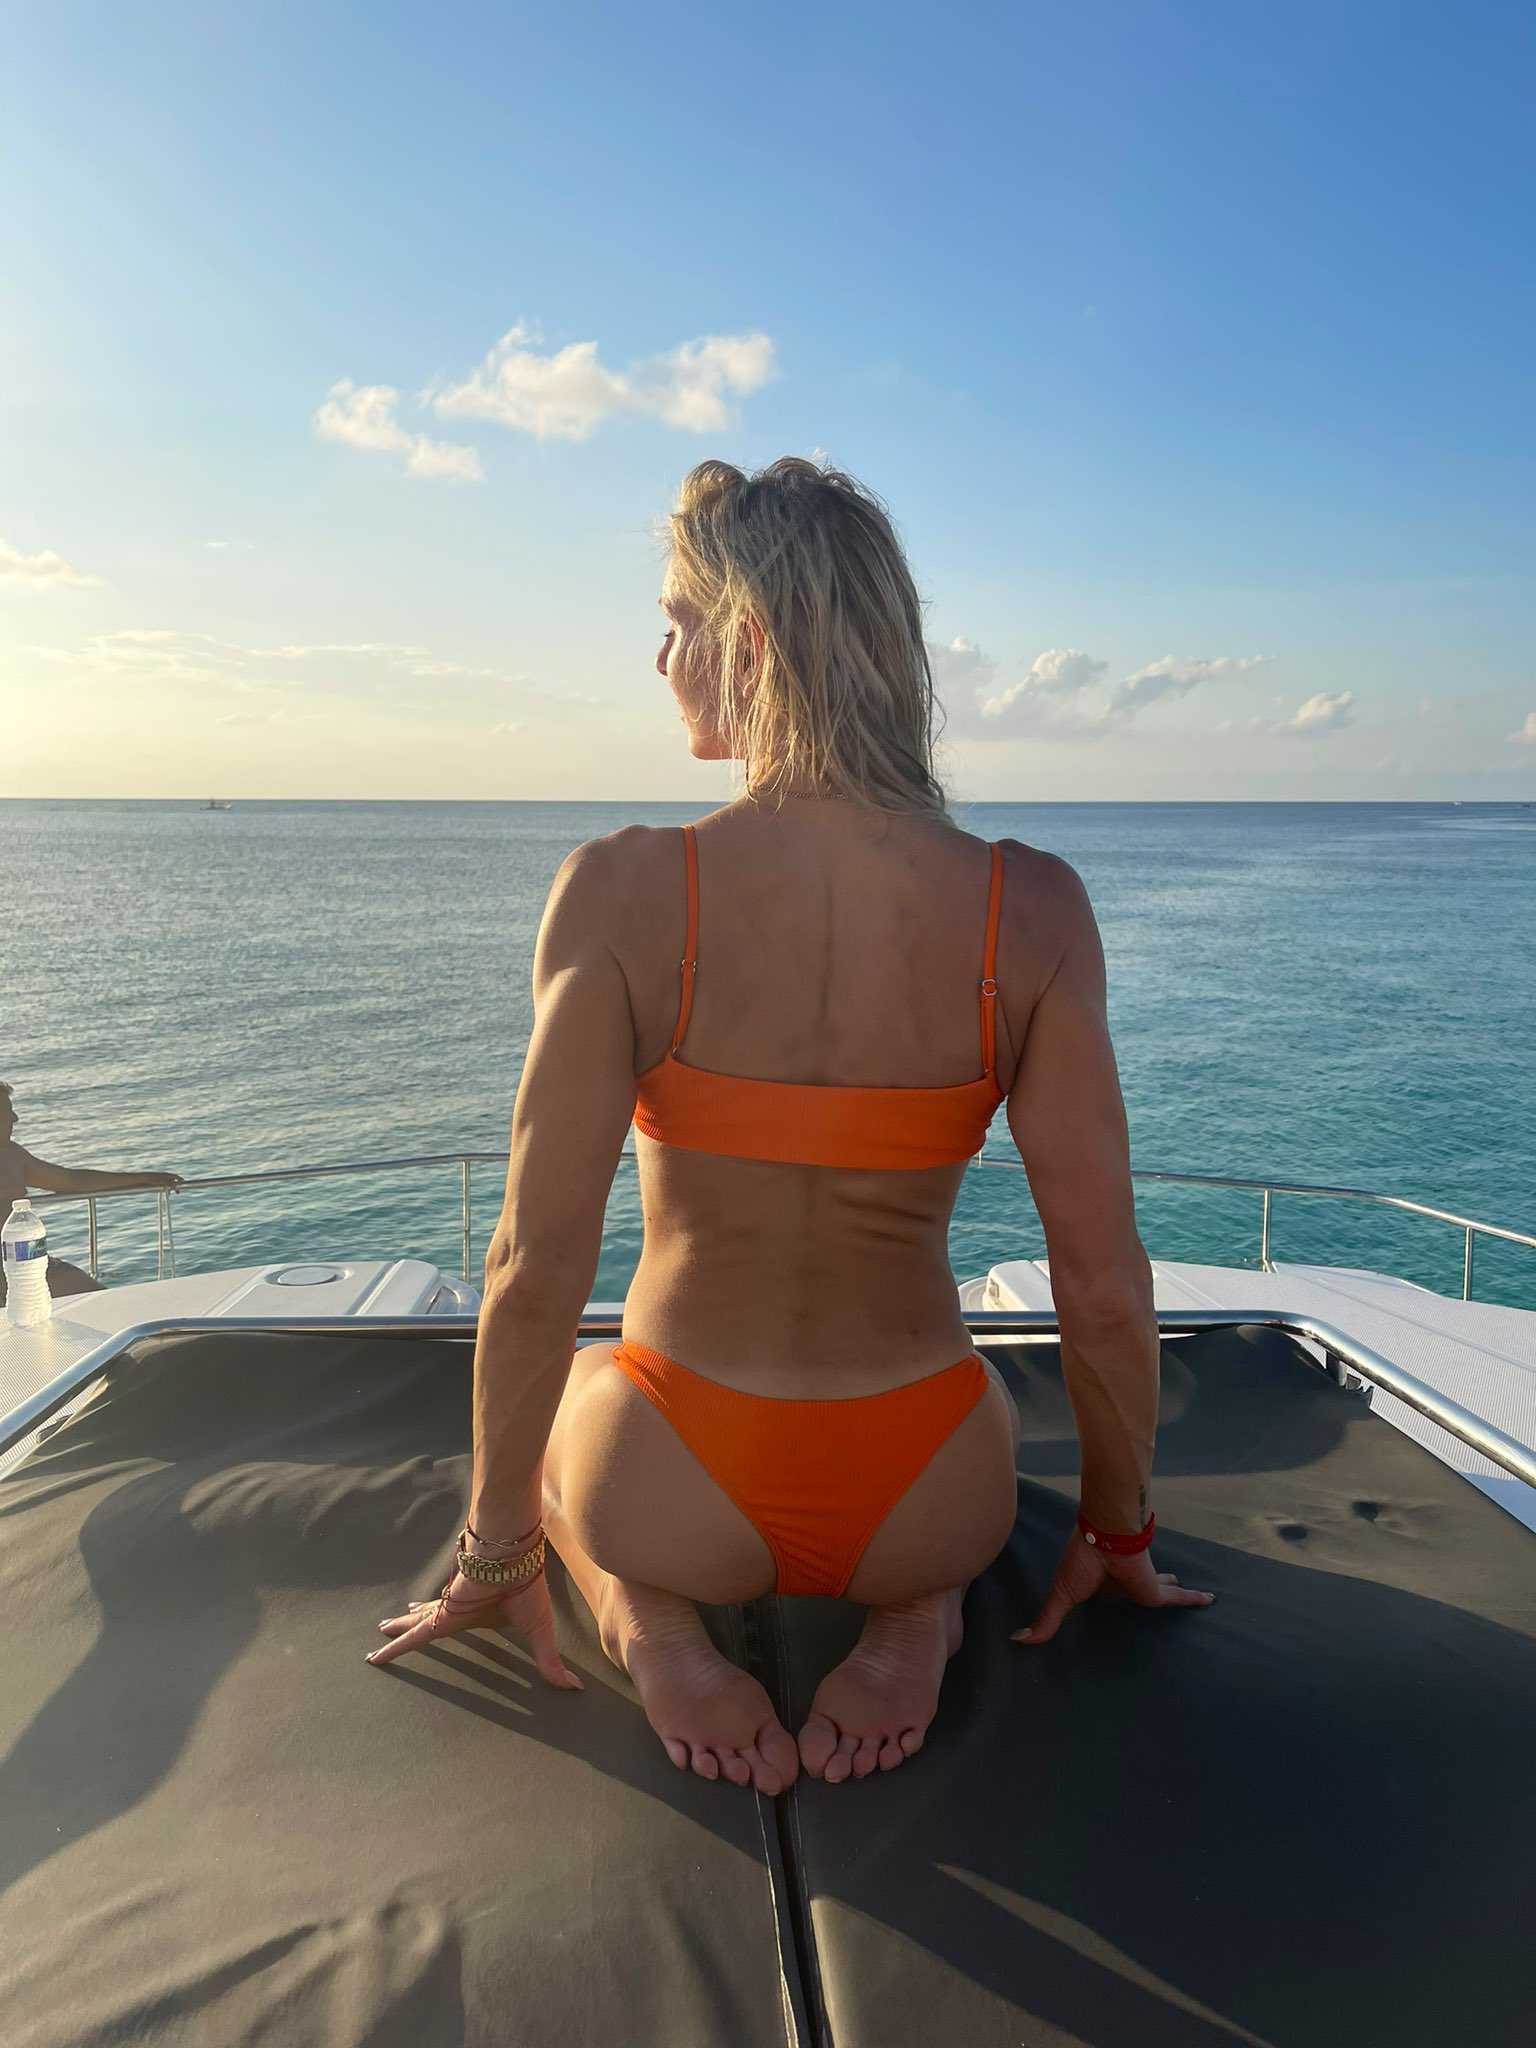 Photos: WWE Star Charlotte Flair Shares Bikini Spam From Latest Vacation 3